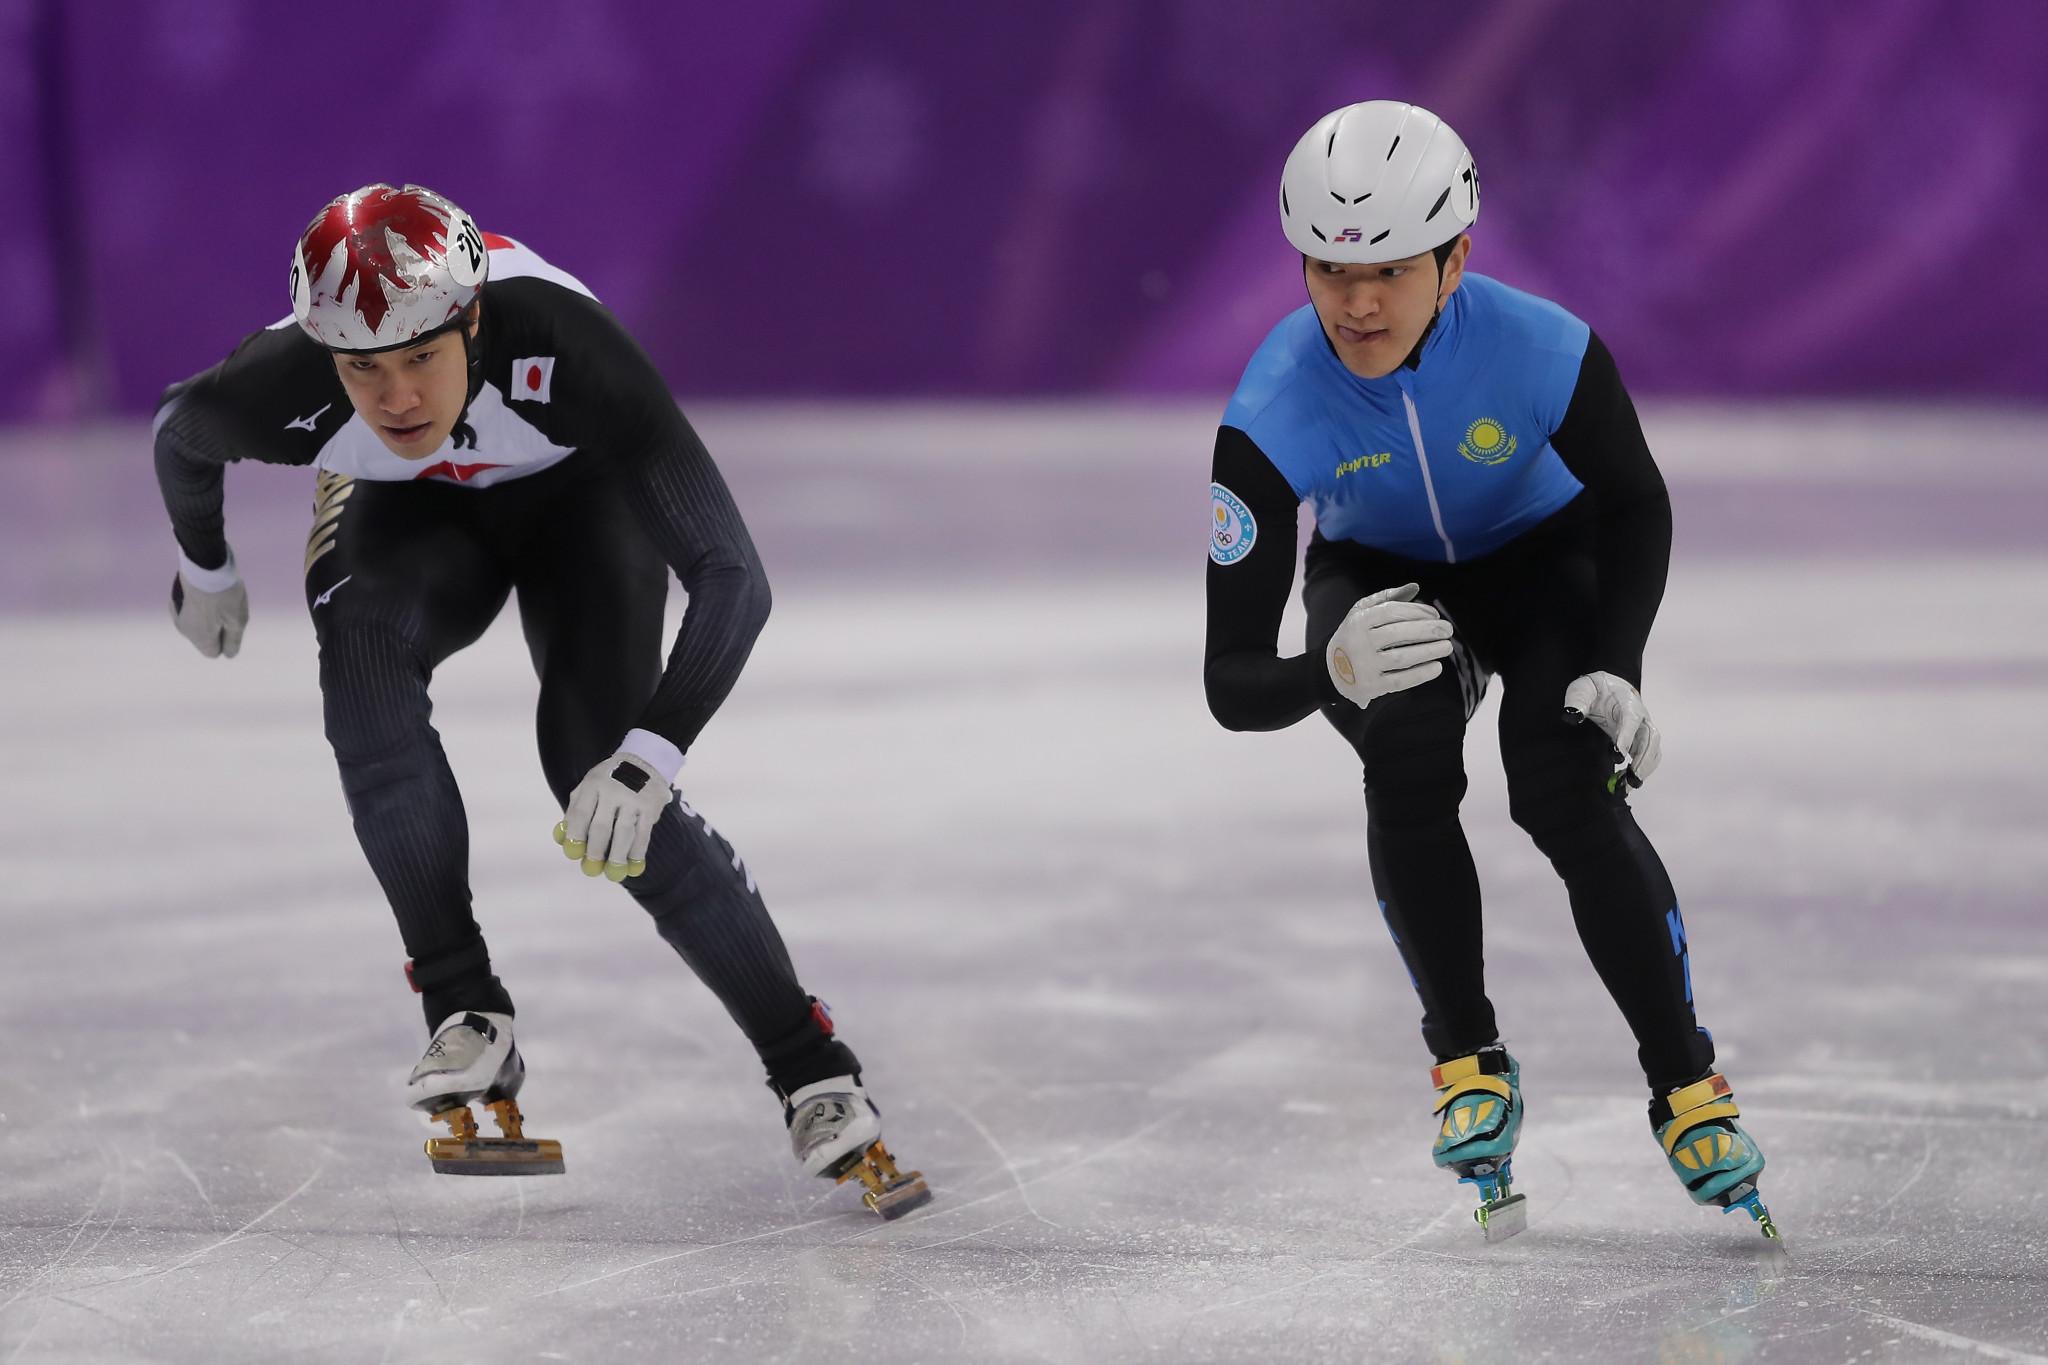 Short Track Speed Skating At The 2020 Olympic Winter Games.Azhgaliyev Shines At Isu Short Track Speed Skating World Cup